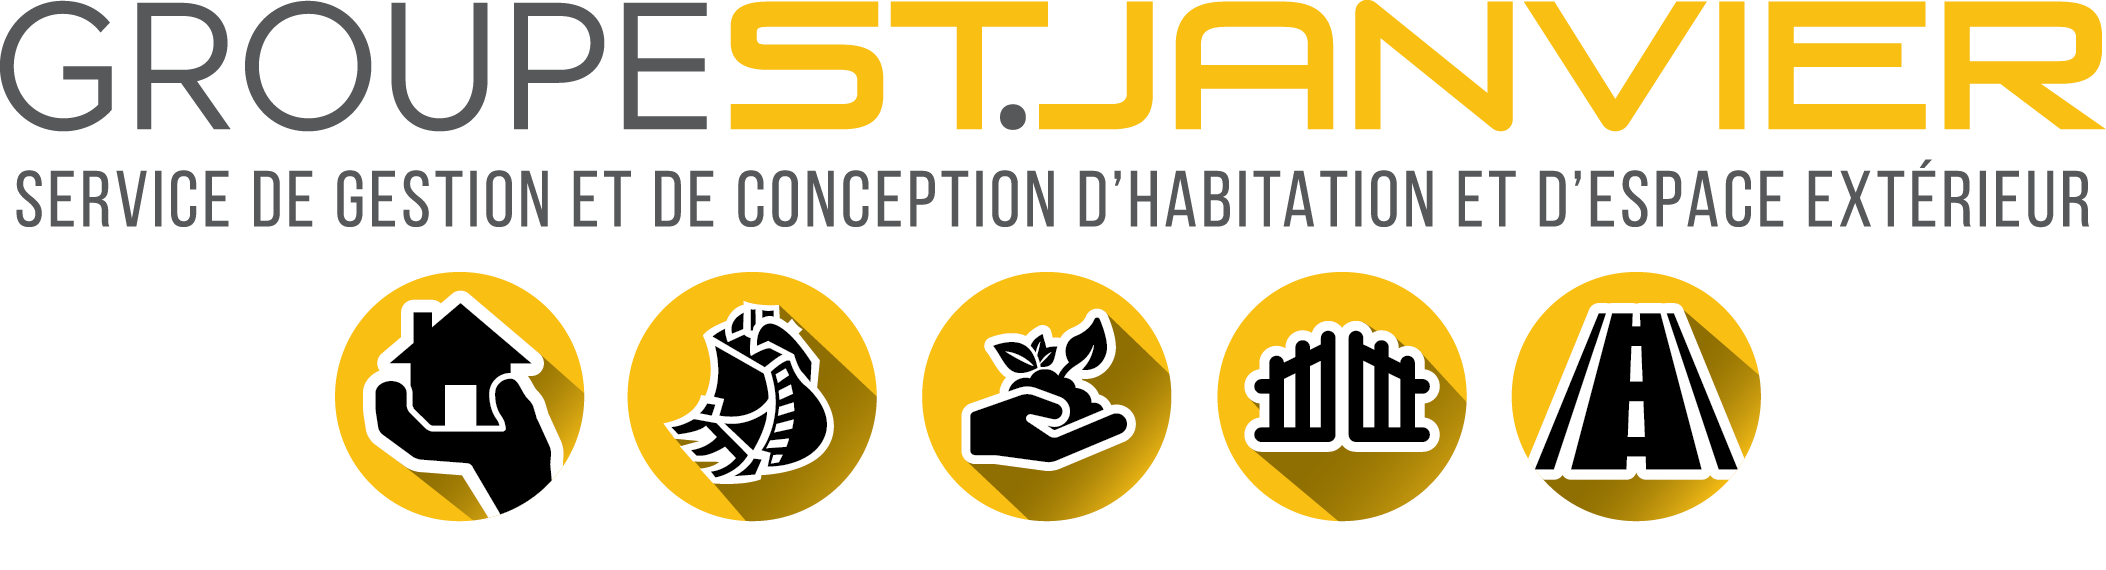 logo groupe st-janvier